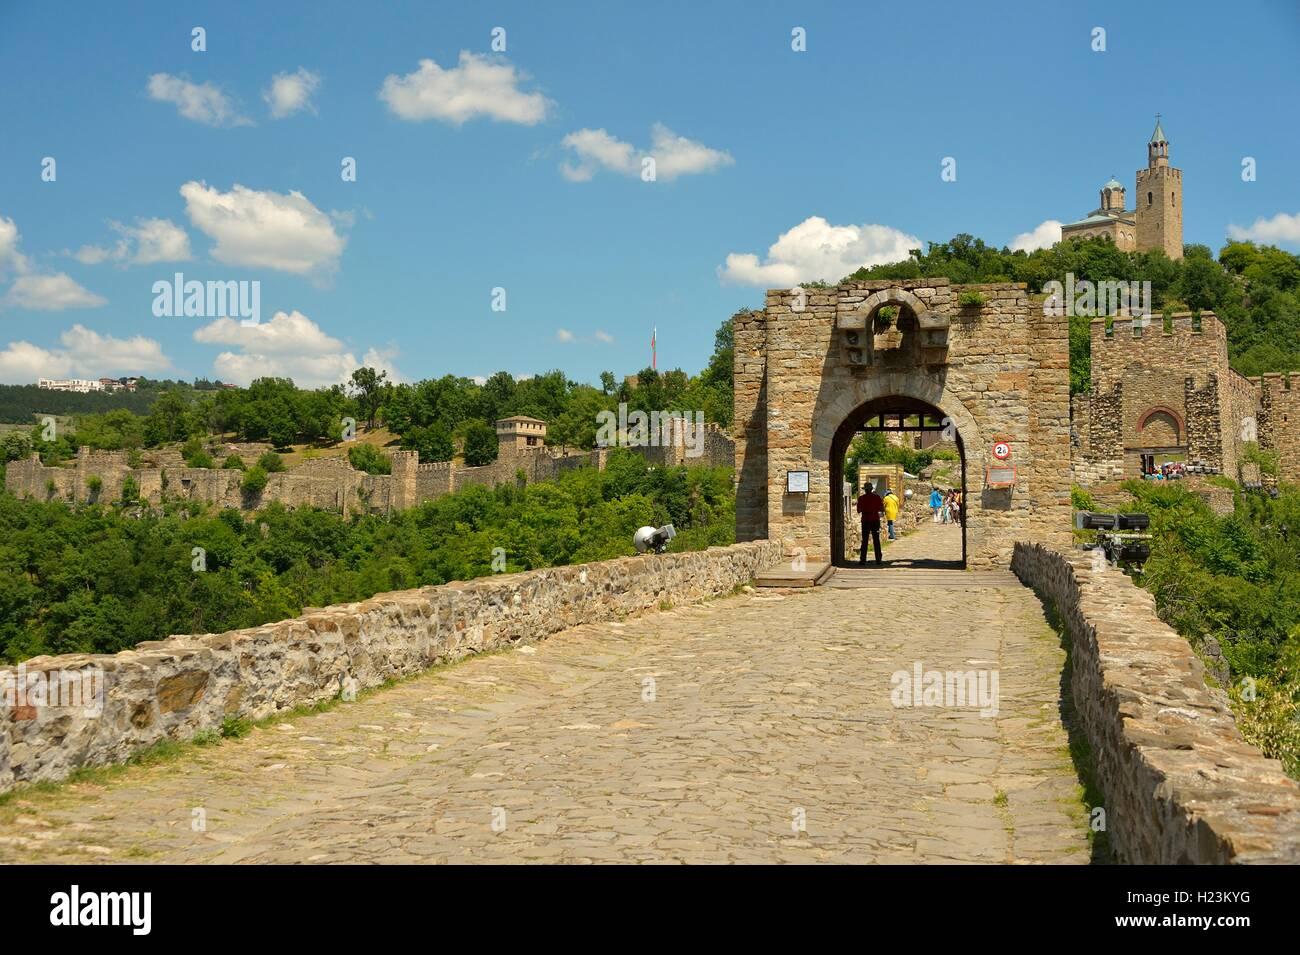 Tsarevets Fortress, Veliko Tarnovo, Bulgaria Stock Photo